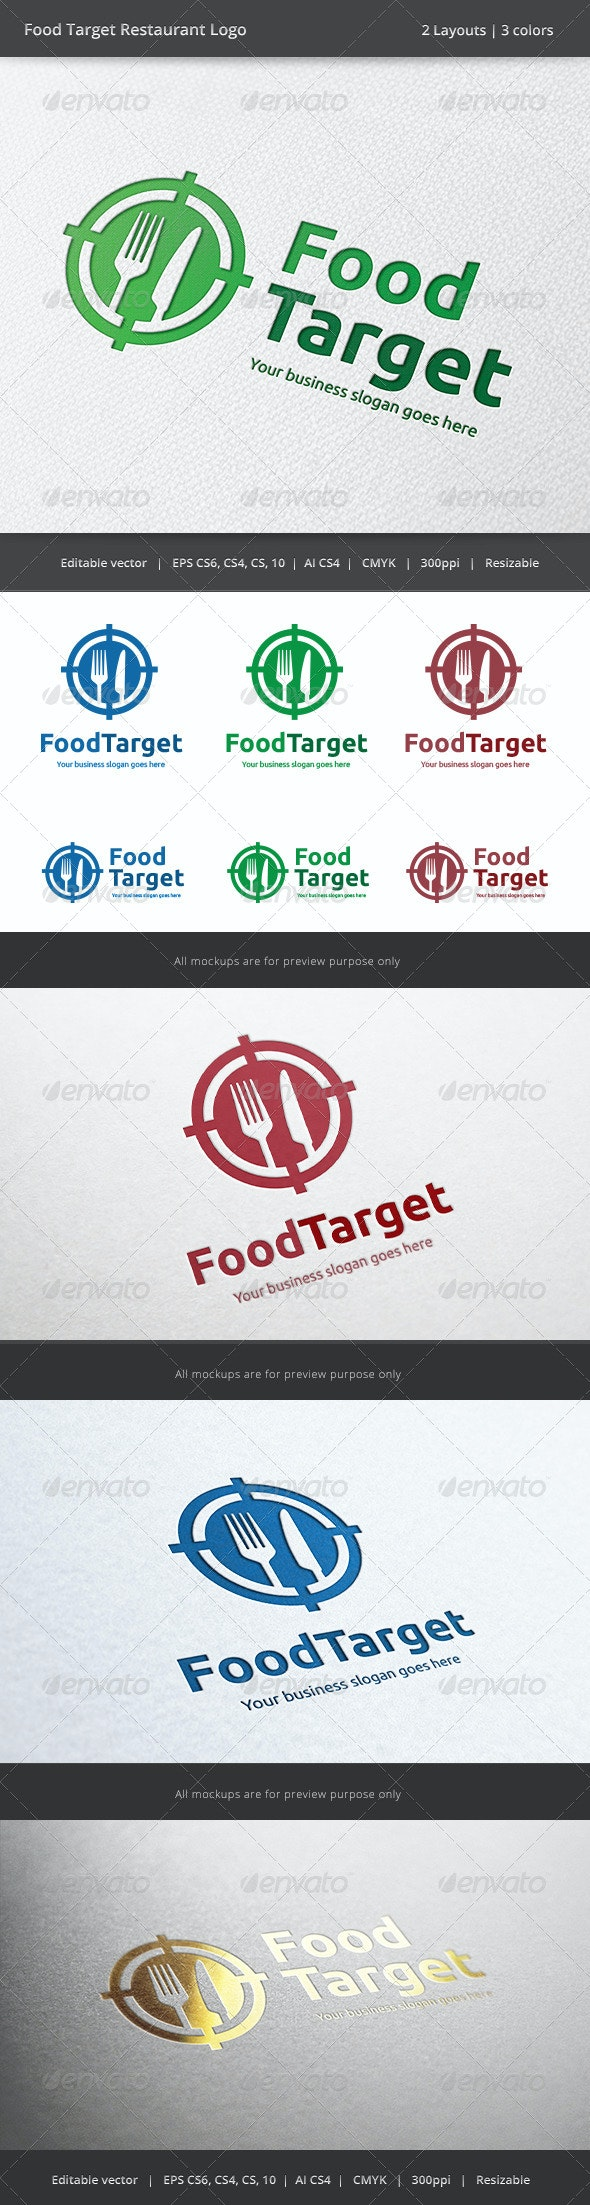 Food Target Restaurant Logo - Restaurant Logo Templates